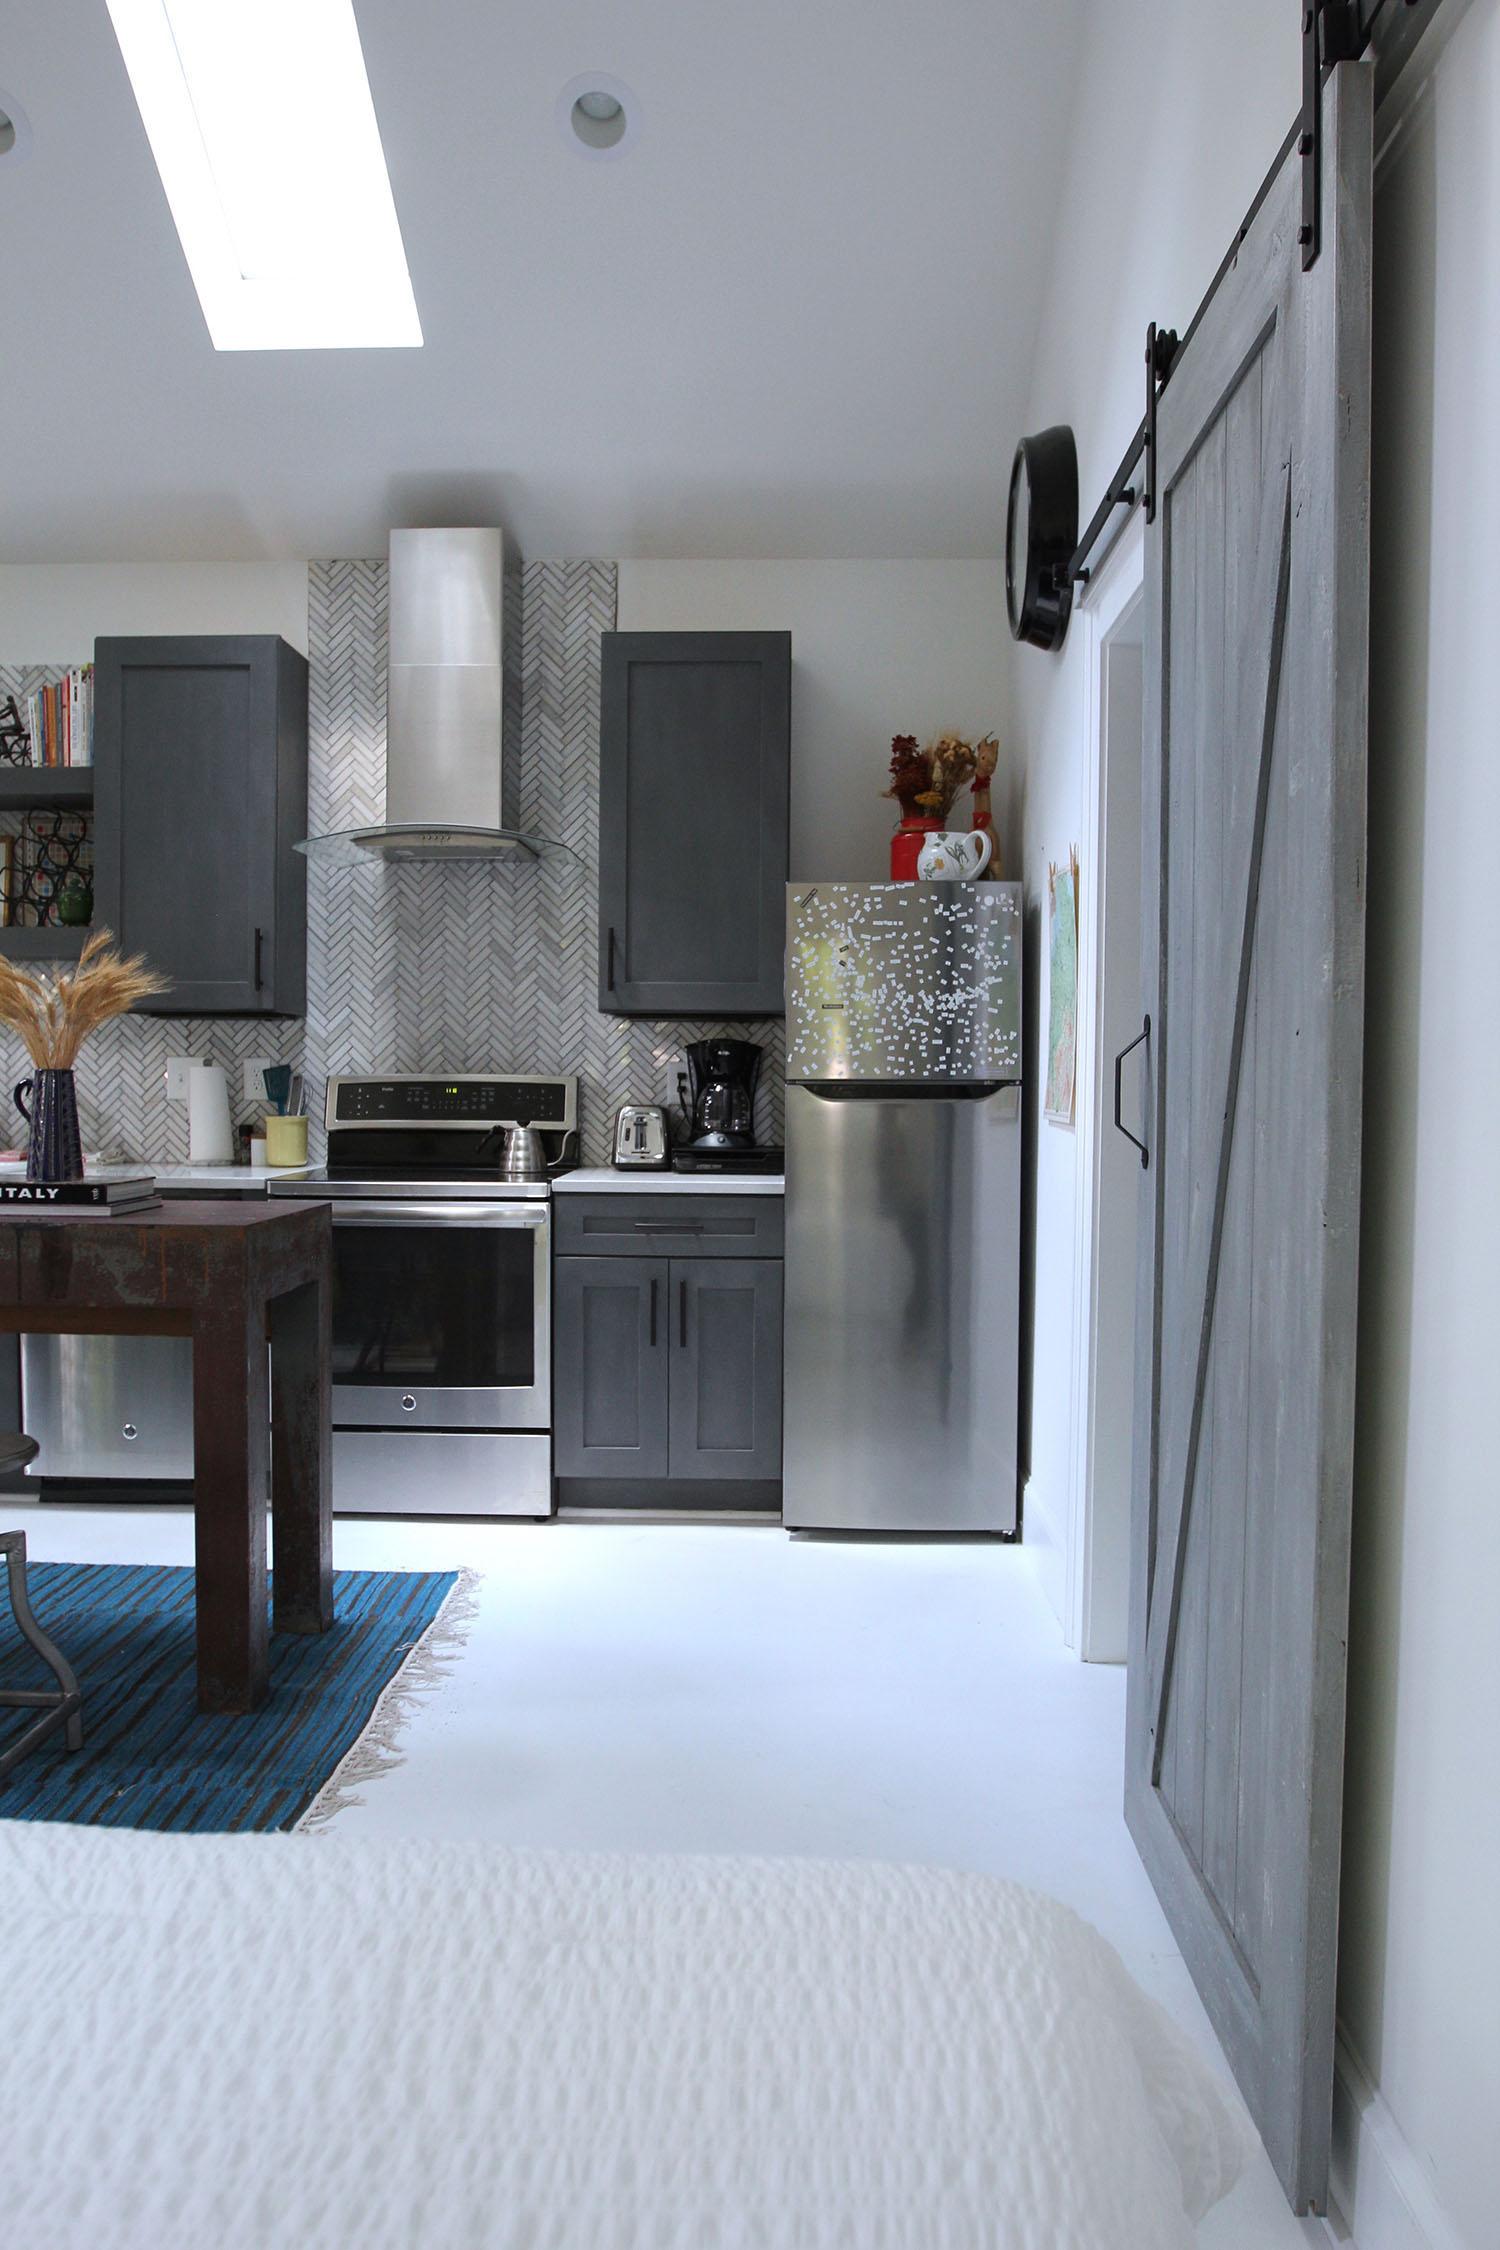 jo-torrijos-states-of-reverie-atlanta-airbnb-modern-bungalow12.jpg